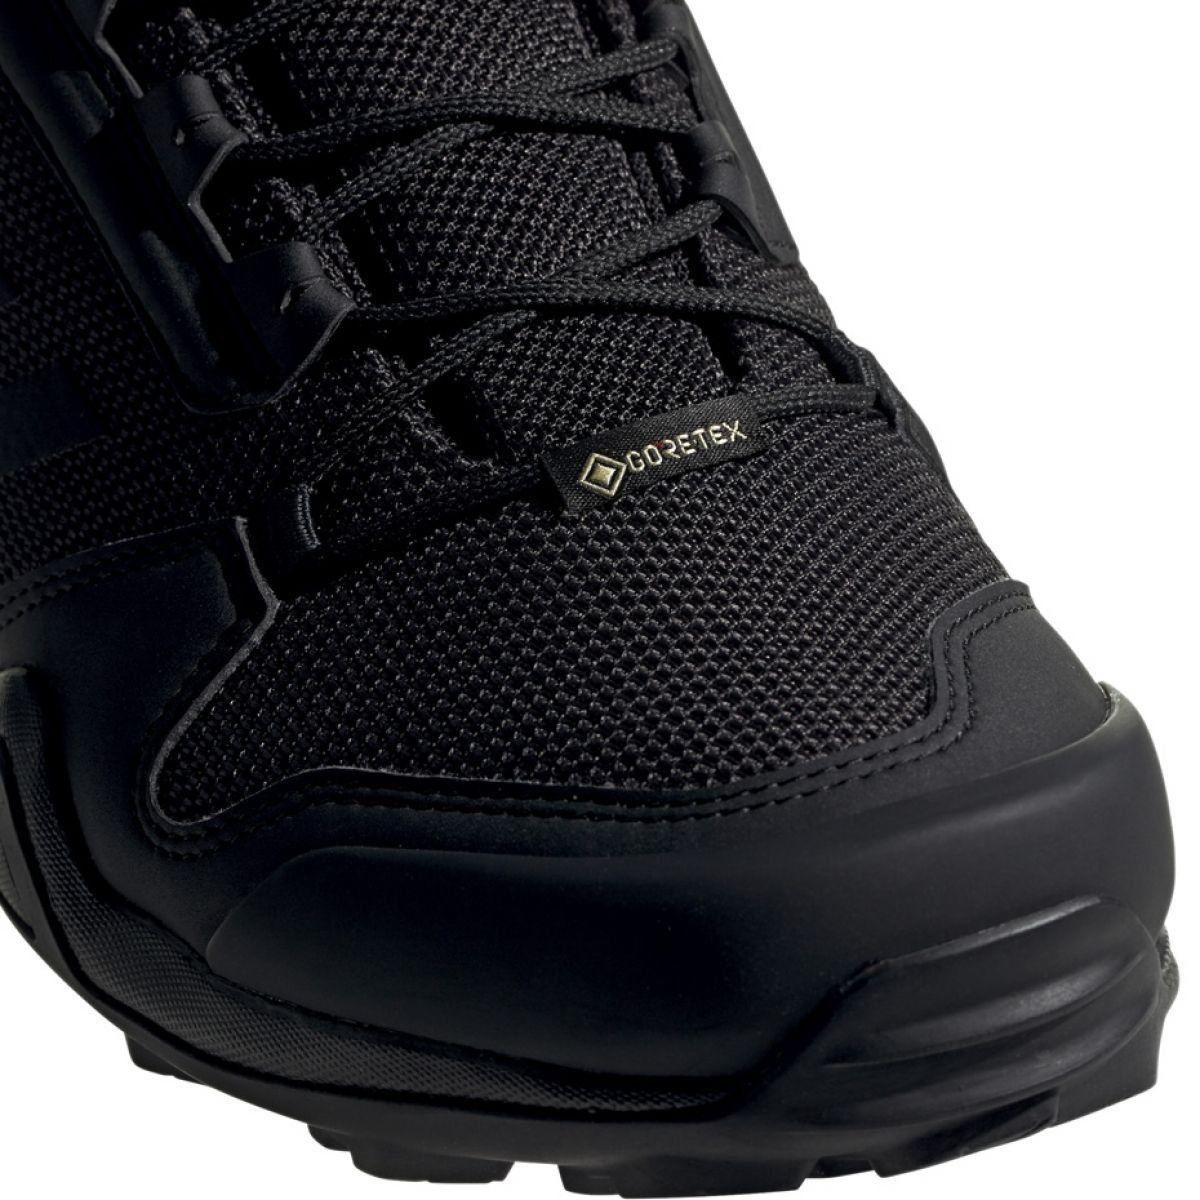 Trekking shoes shoes men Adidas adidas TERREX AX3 GTX Gore Tex GORE TEX outdoor hiking man sneakers TerrexAX3GTX